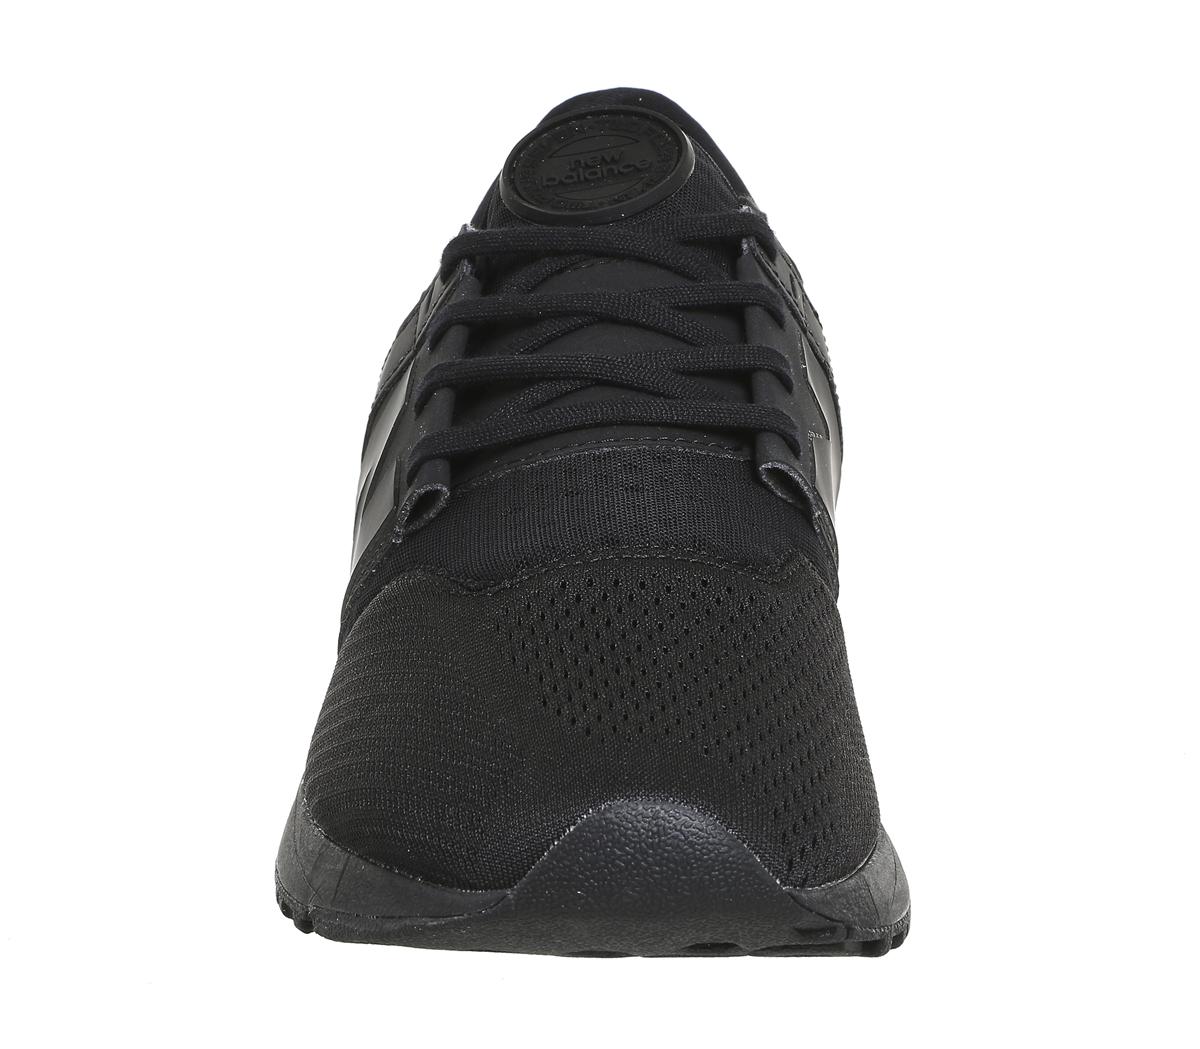 6de3b4631242a Womens New Balance 247 Trainers Black Mono Sport Trainers Shoes